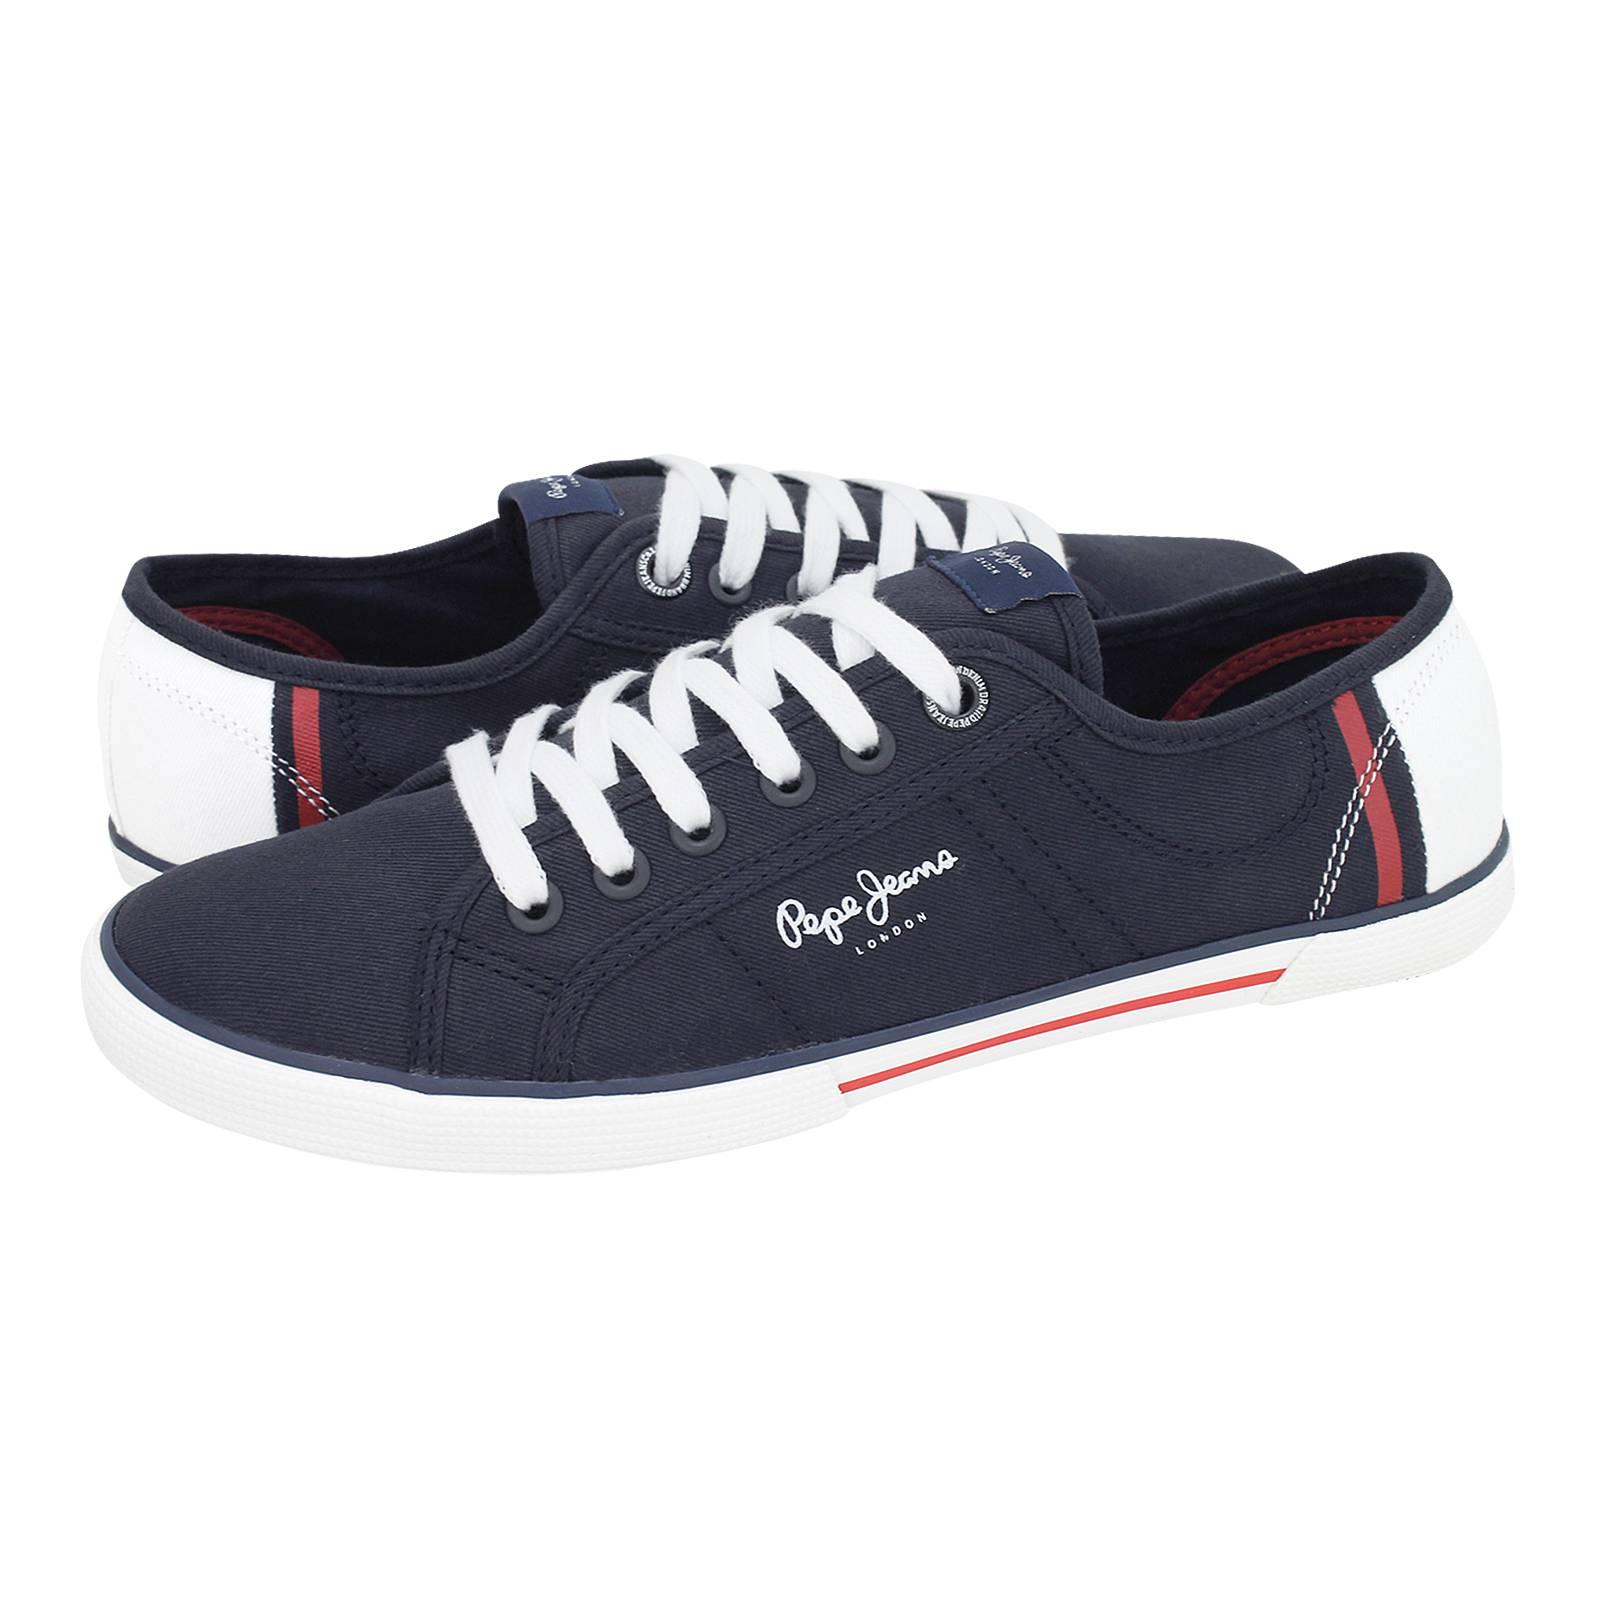 abe9433dcfc Παπούτσια casual Pepe Jeans Civrac